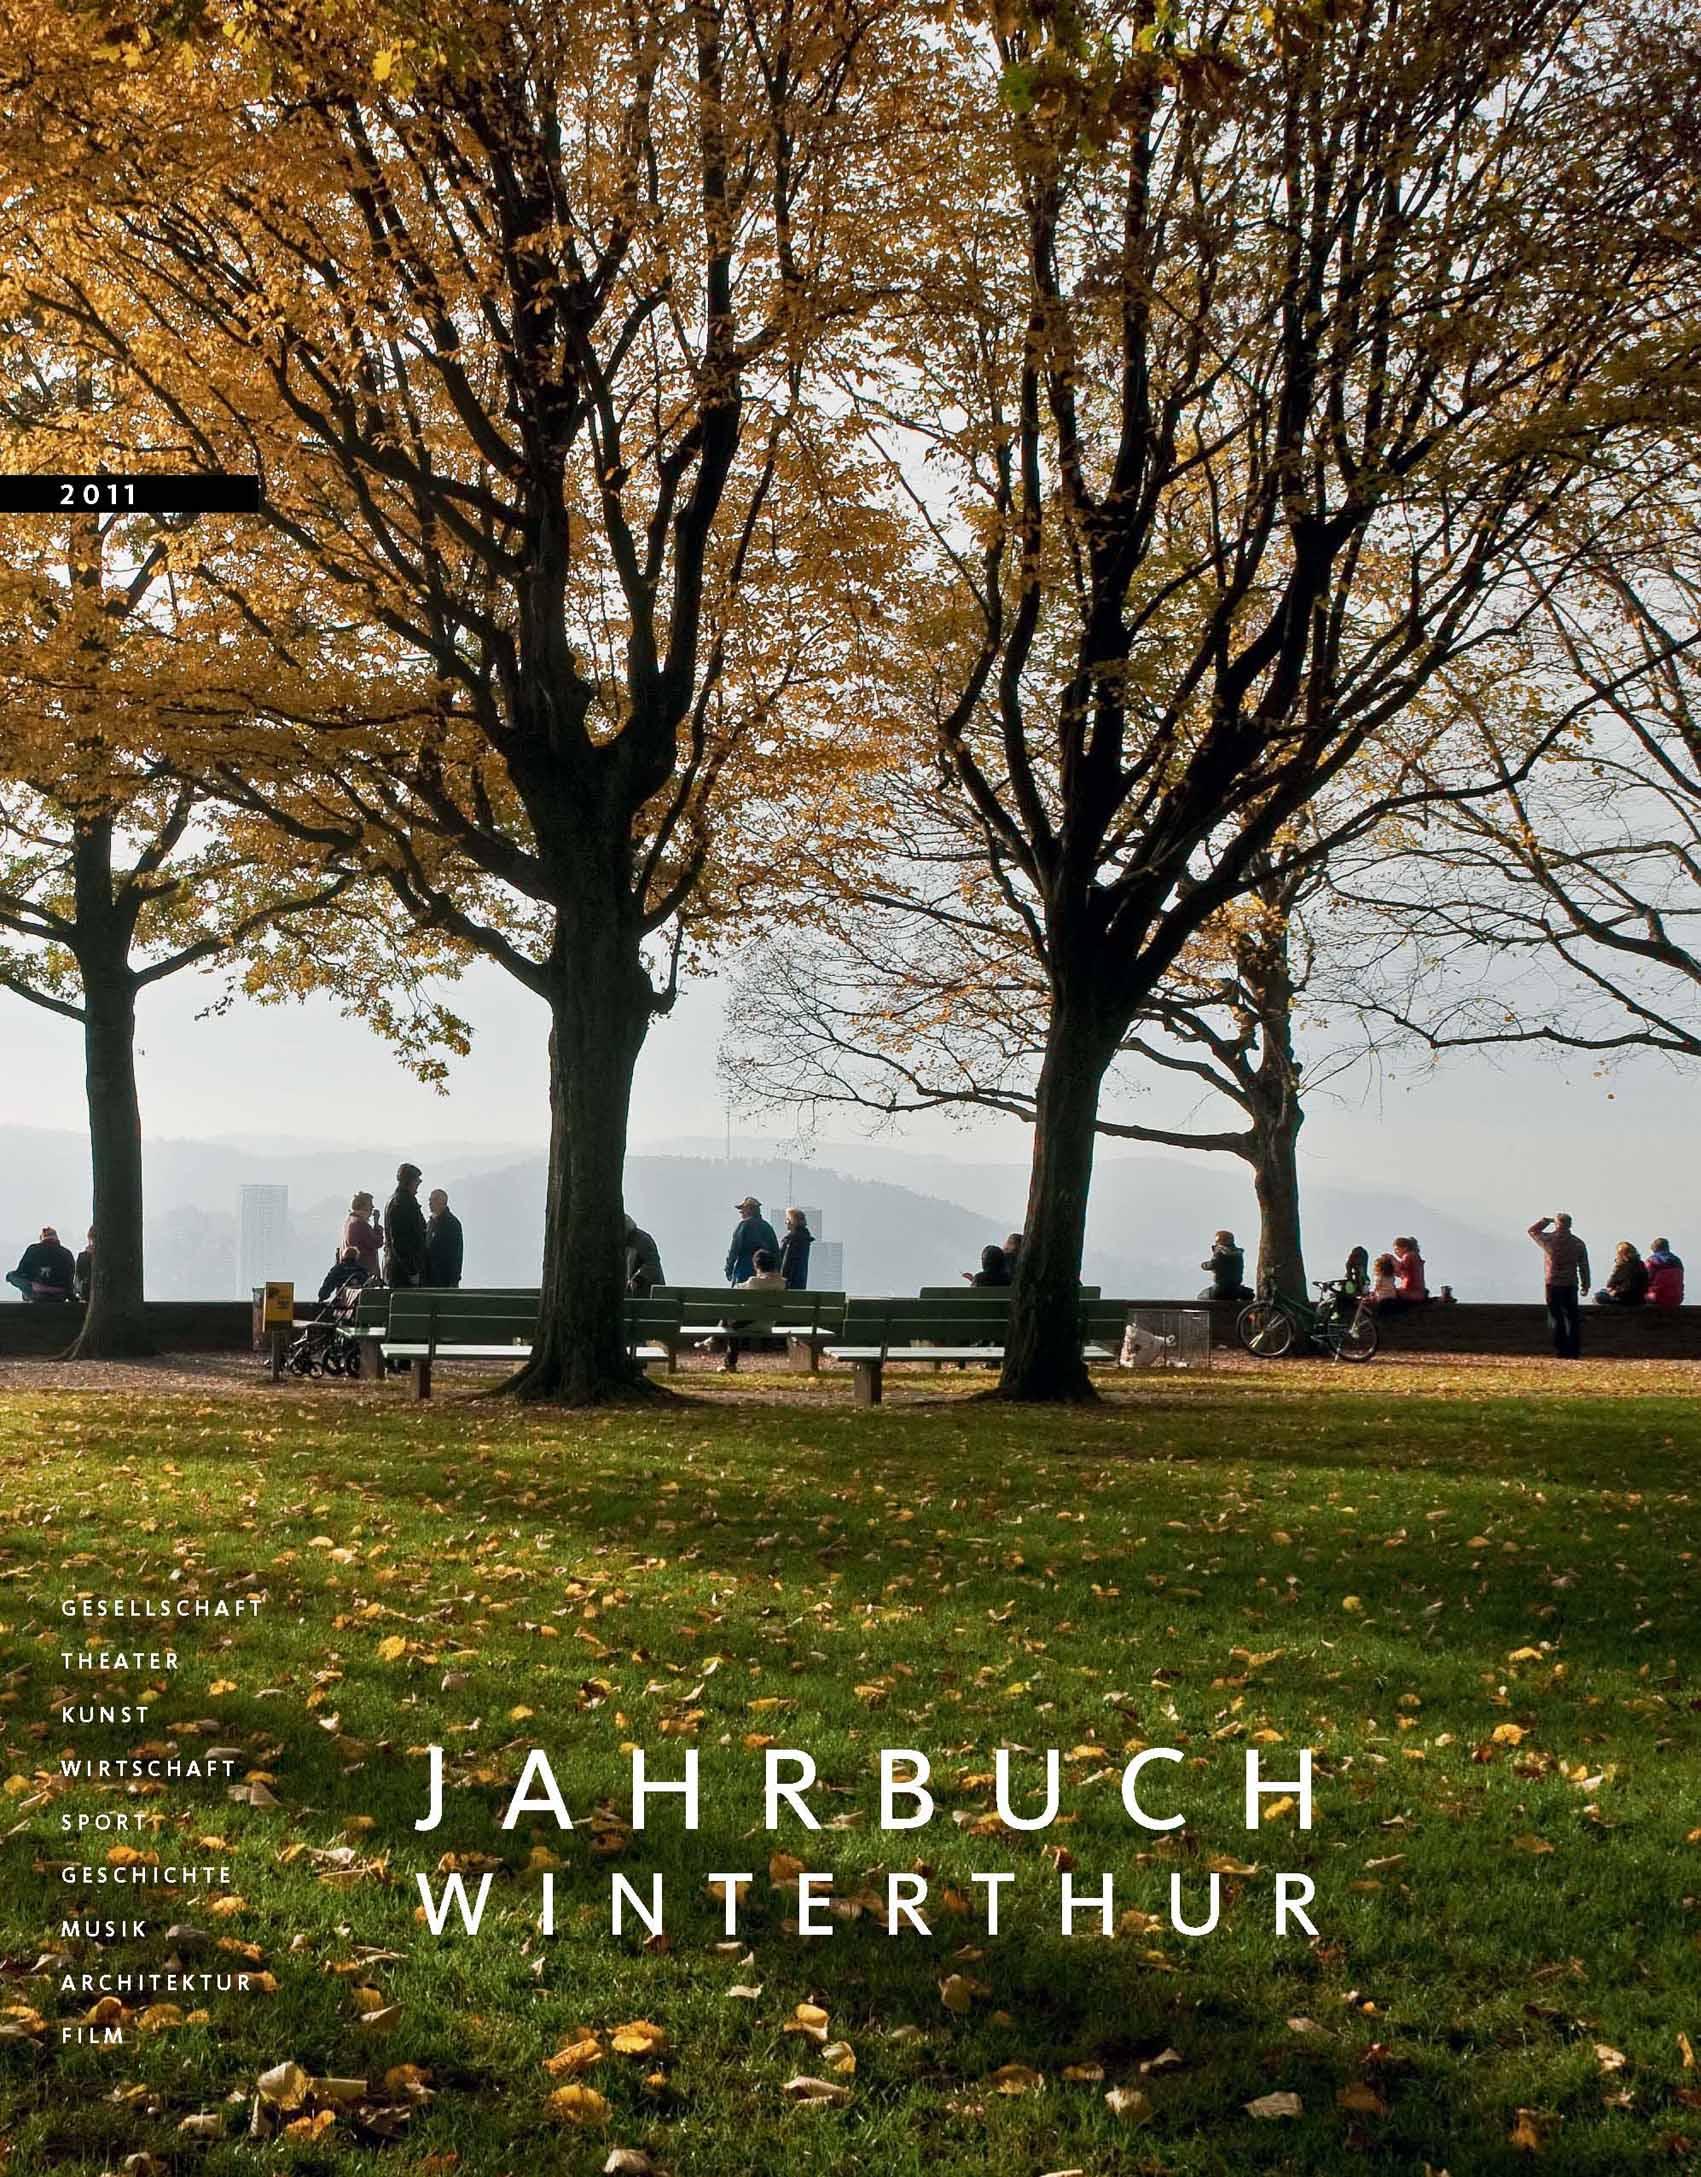 Jahrbuch Winterthur